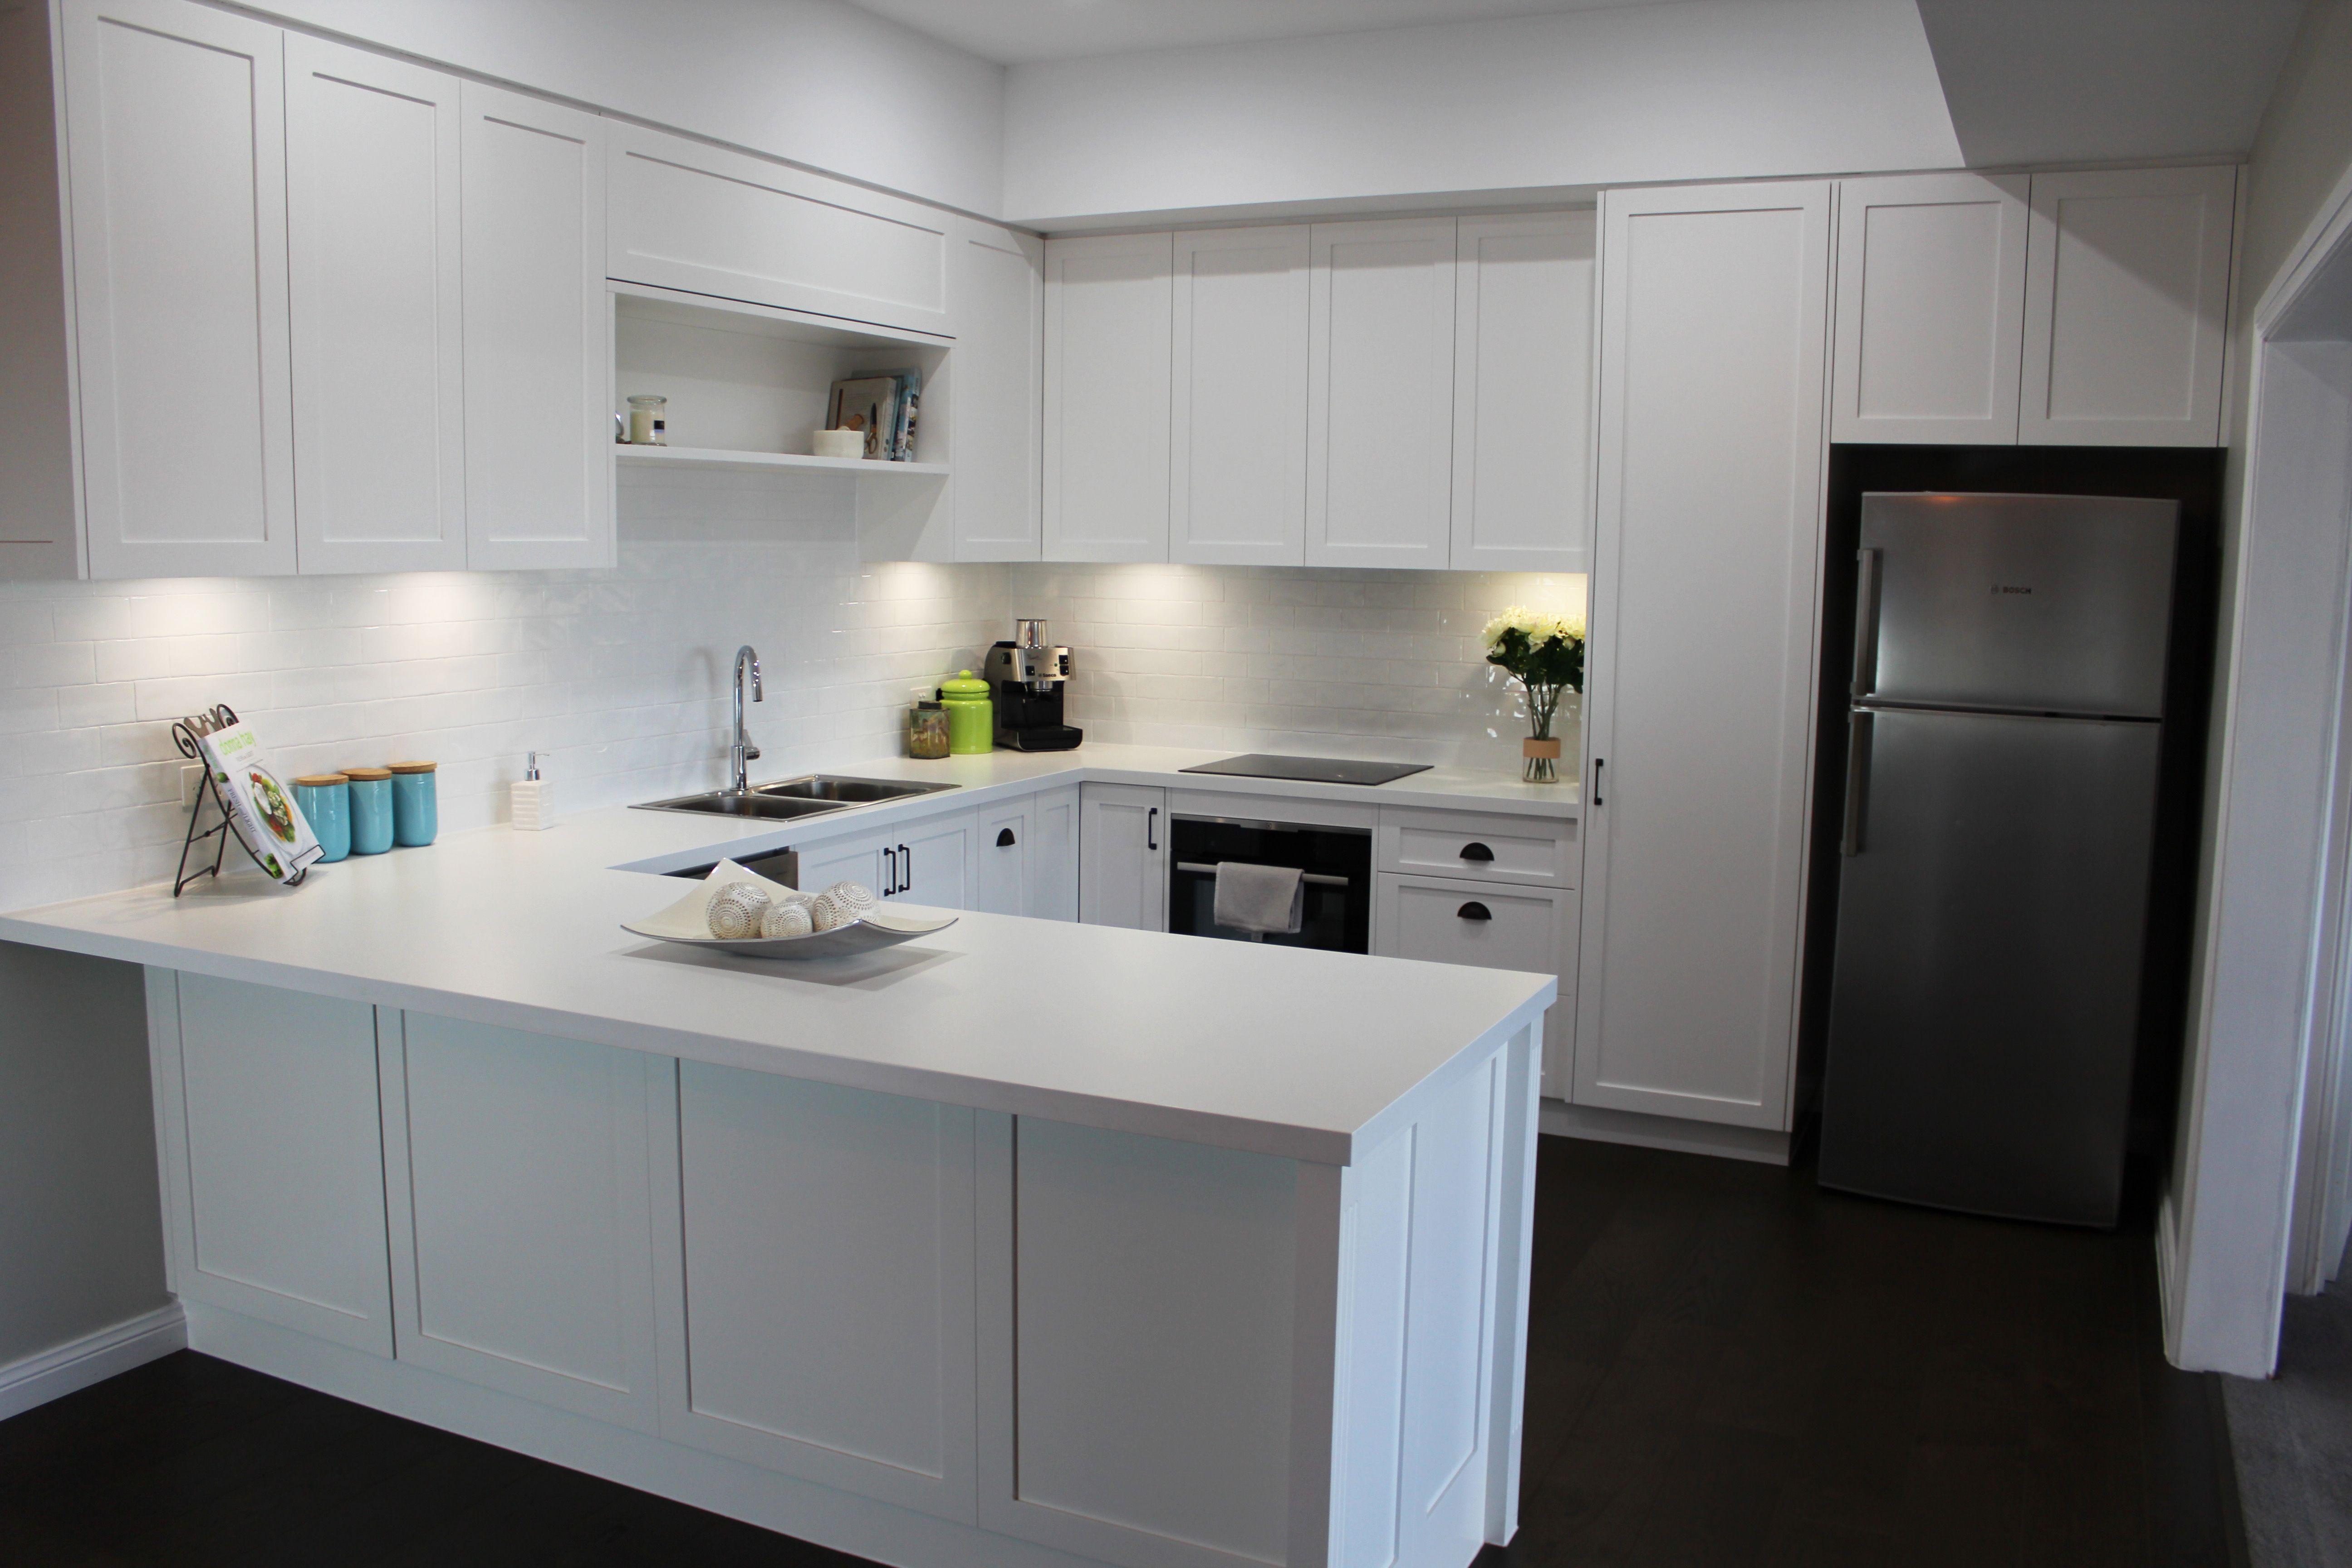 Benchtop polytec classic white matt 40mm abs edge panels for Cheap kitchen benchtop ideas